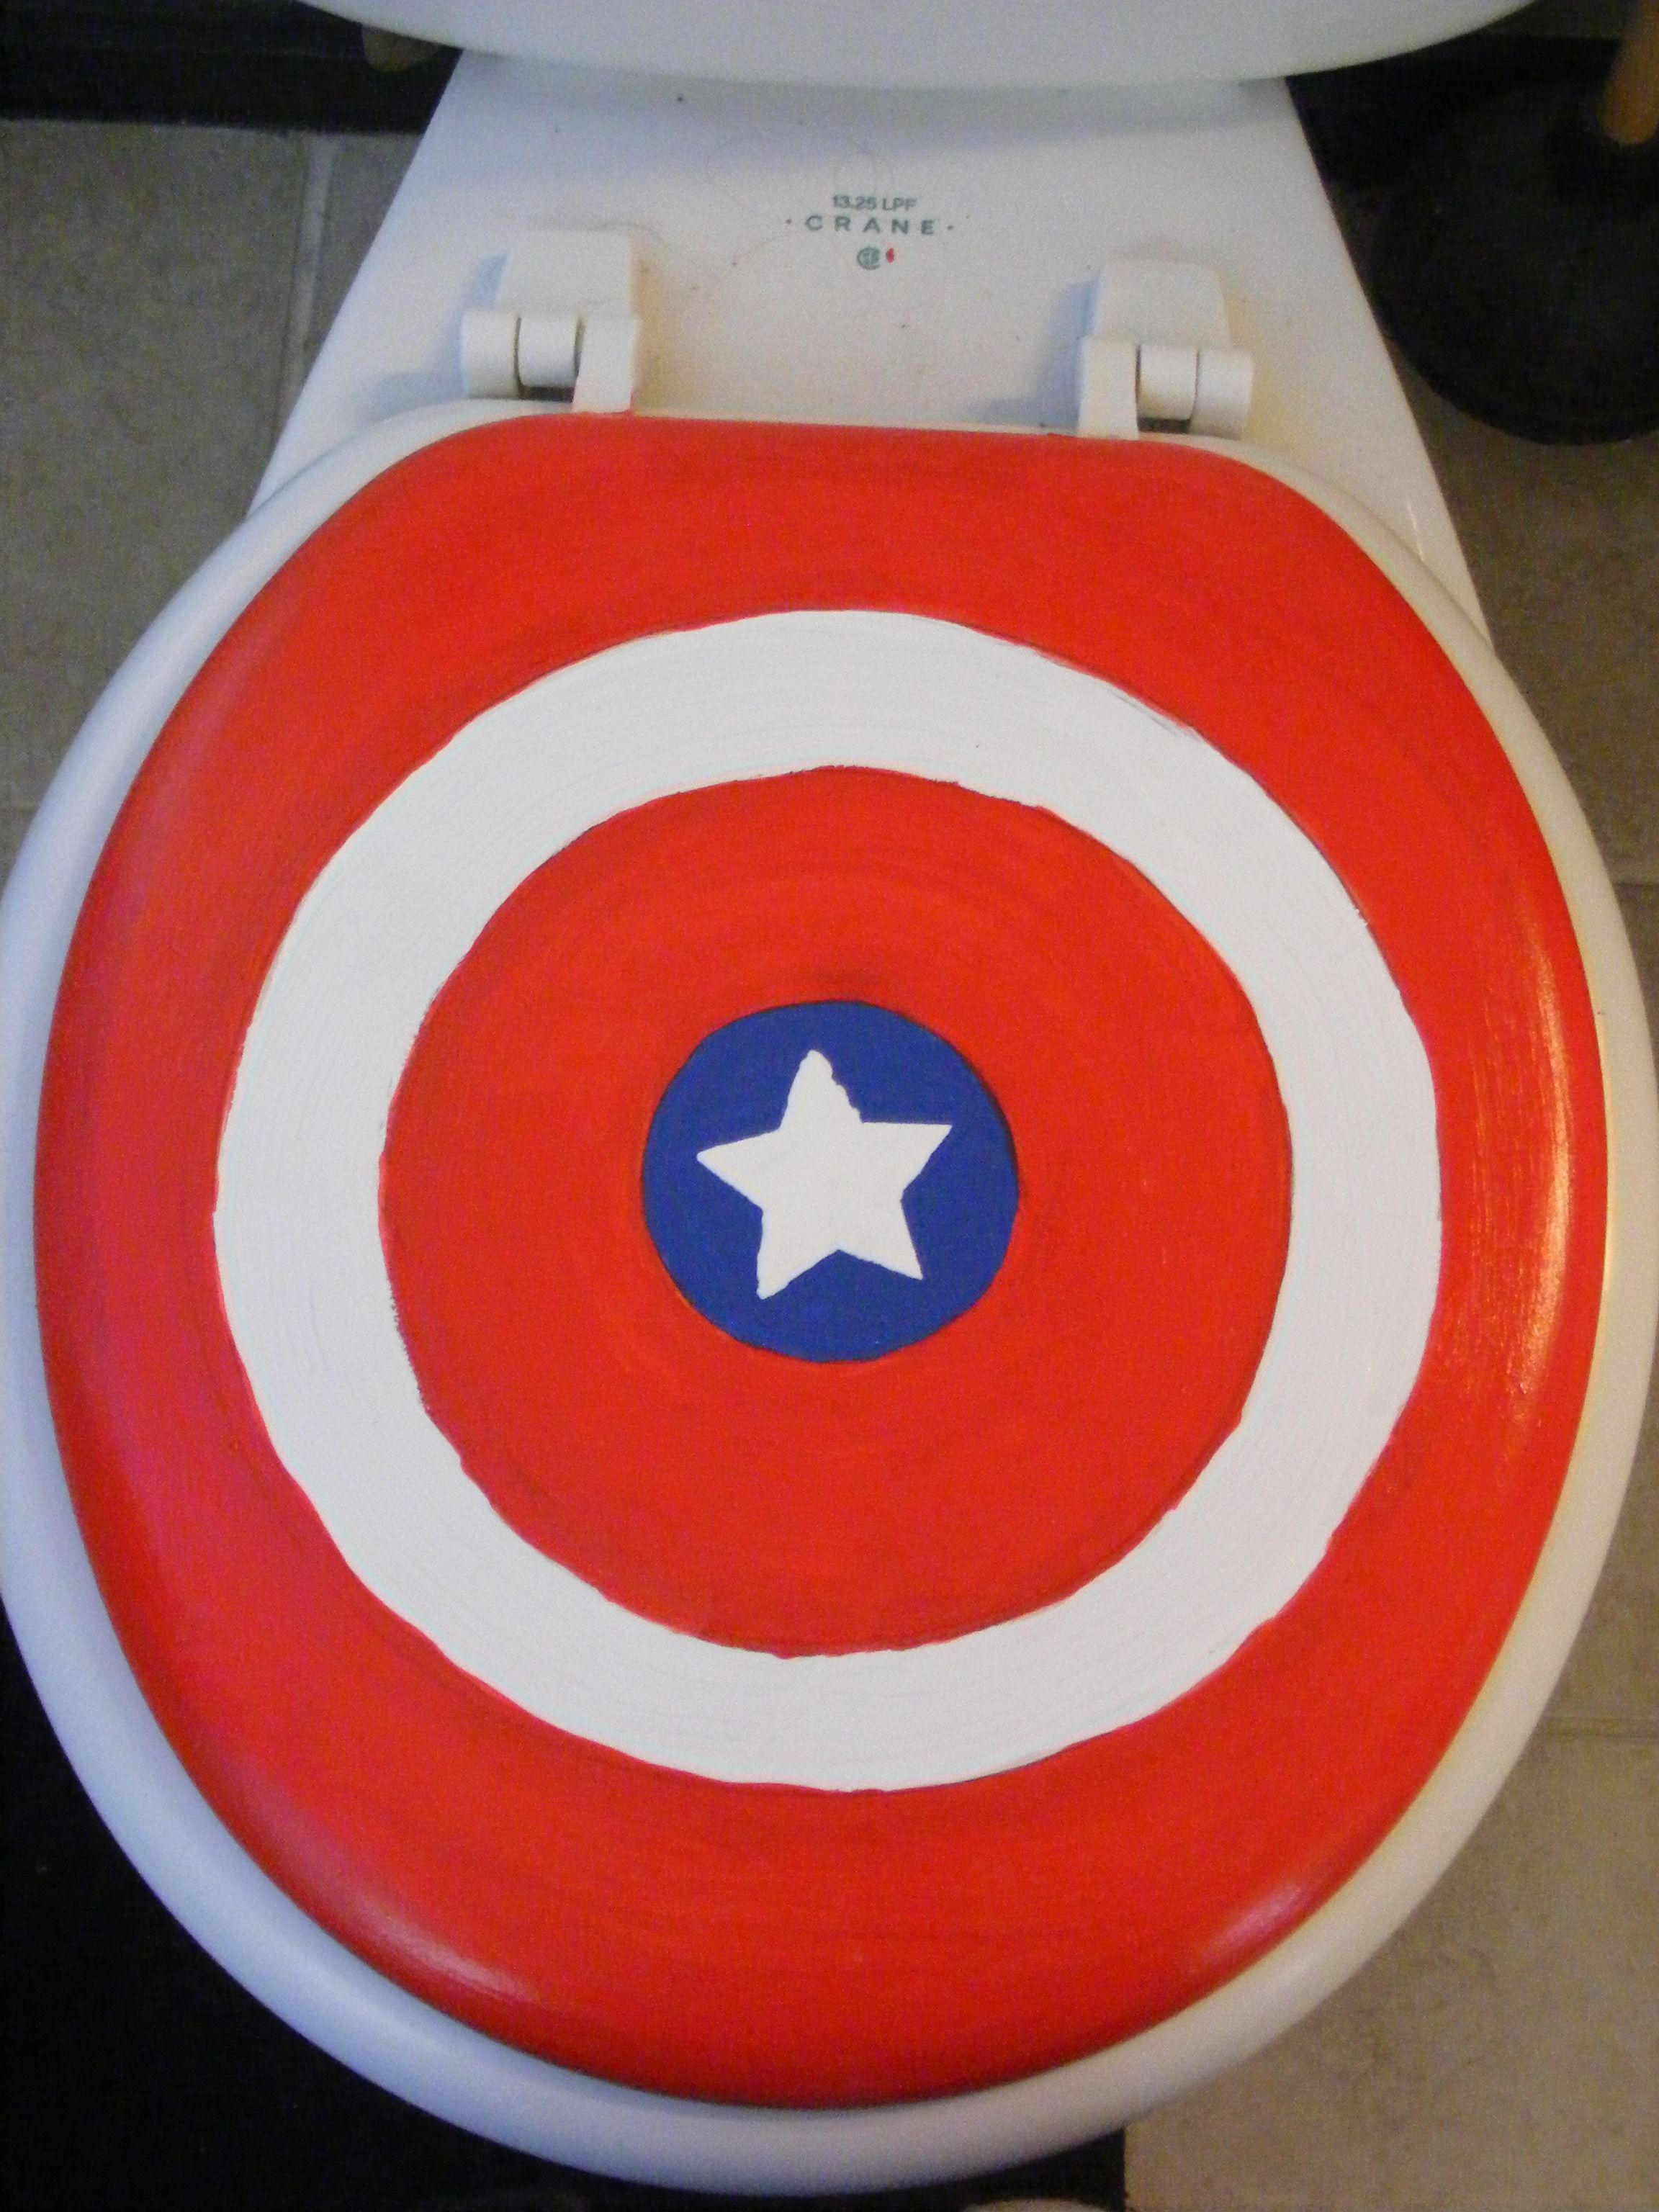 Toilet Seat for Superhero Bathroom | Pinteresting things I\'ve made ...